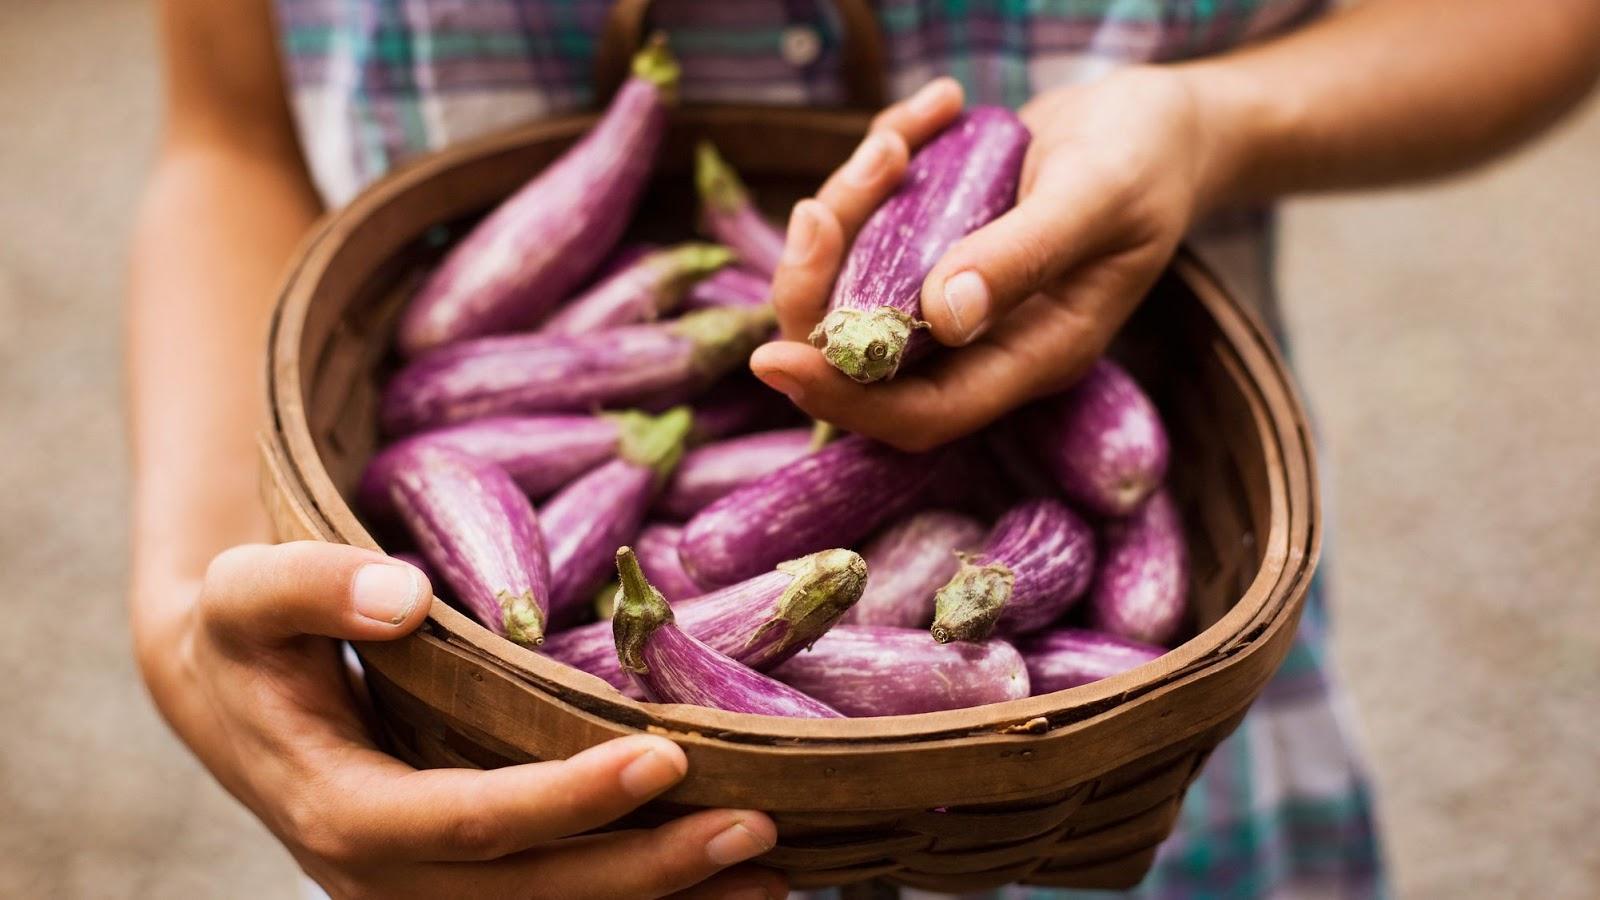 Surprising Health Benefits of Eating Eggplant